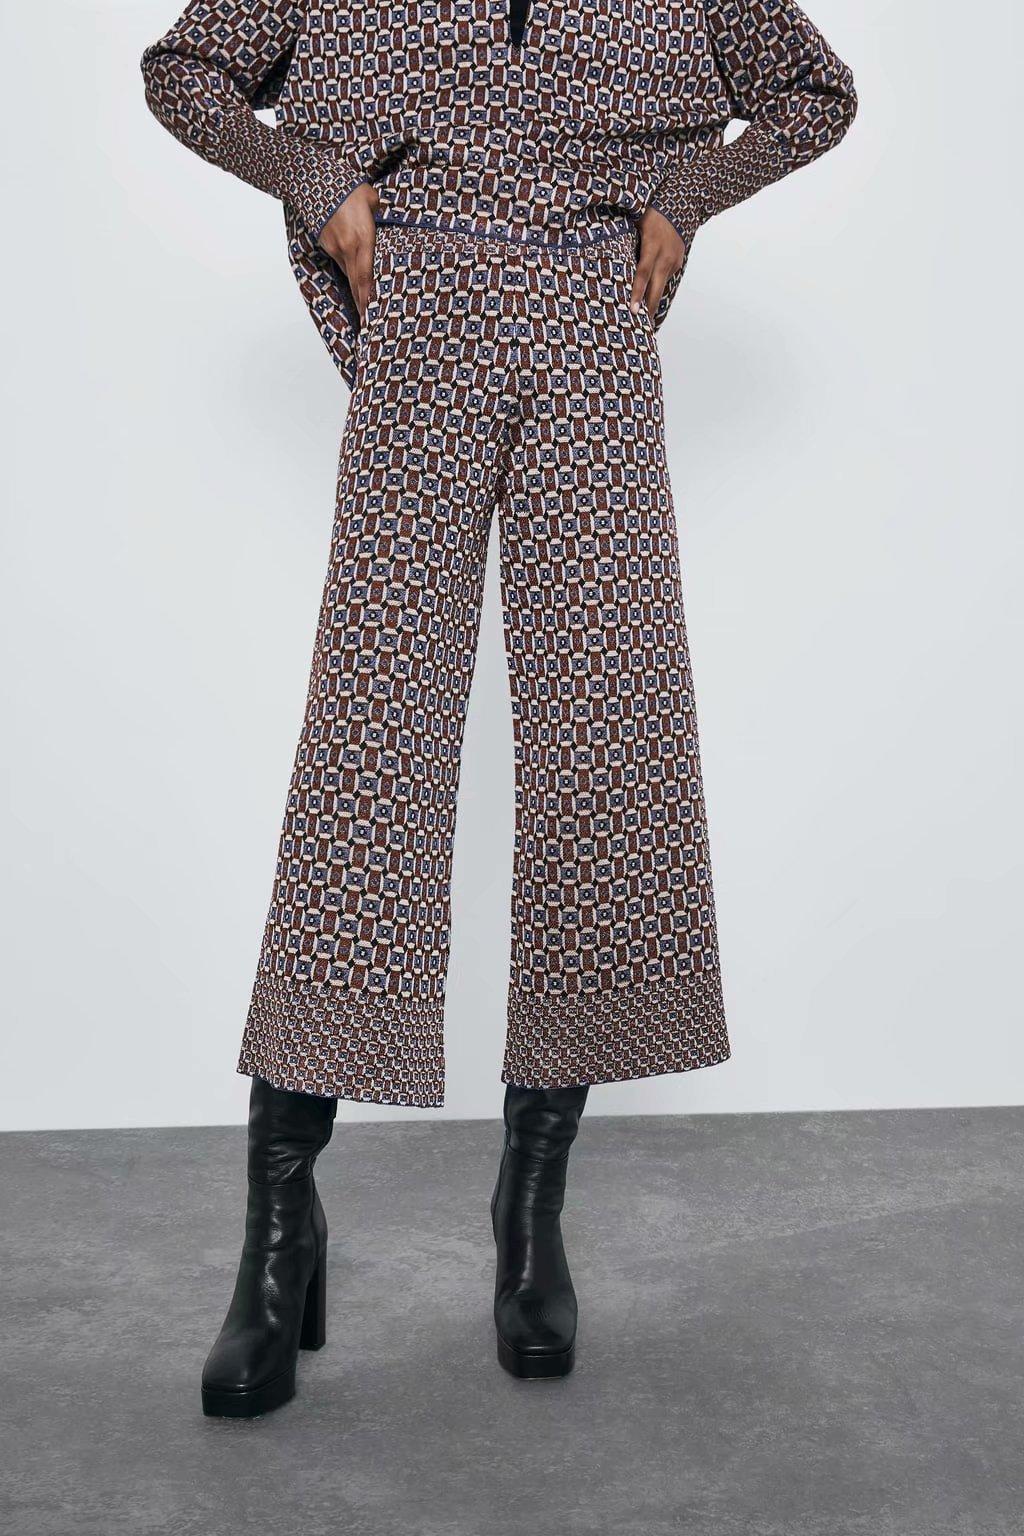 2020 new Spring Summer European zaraing women pants trousers vadiming sheining female pants Trousers streetwear XDL2520